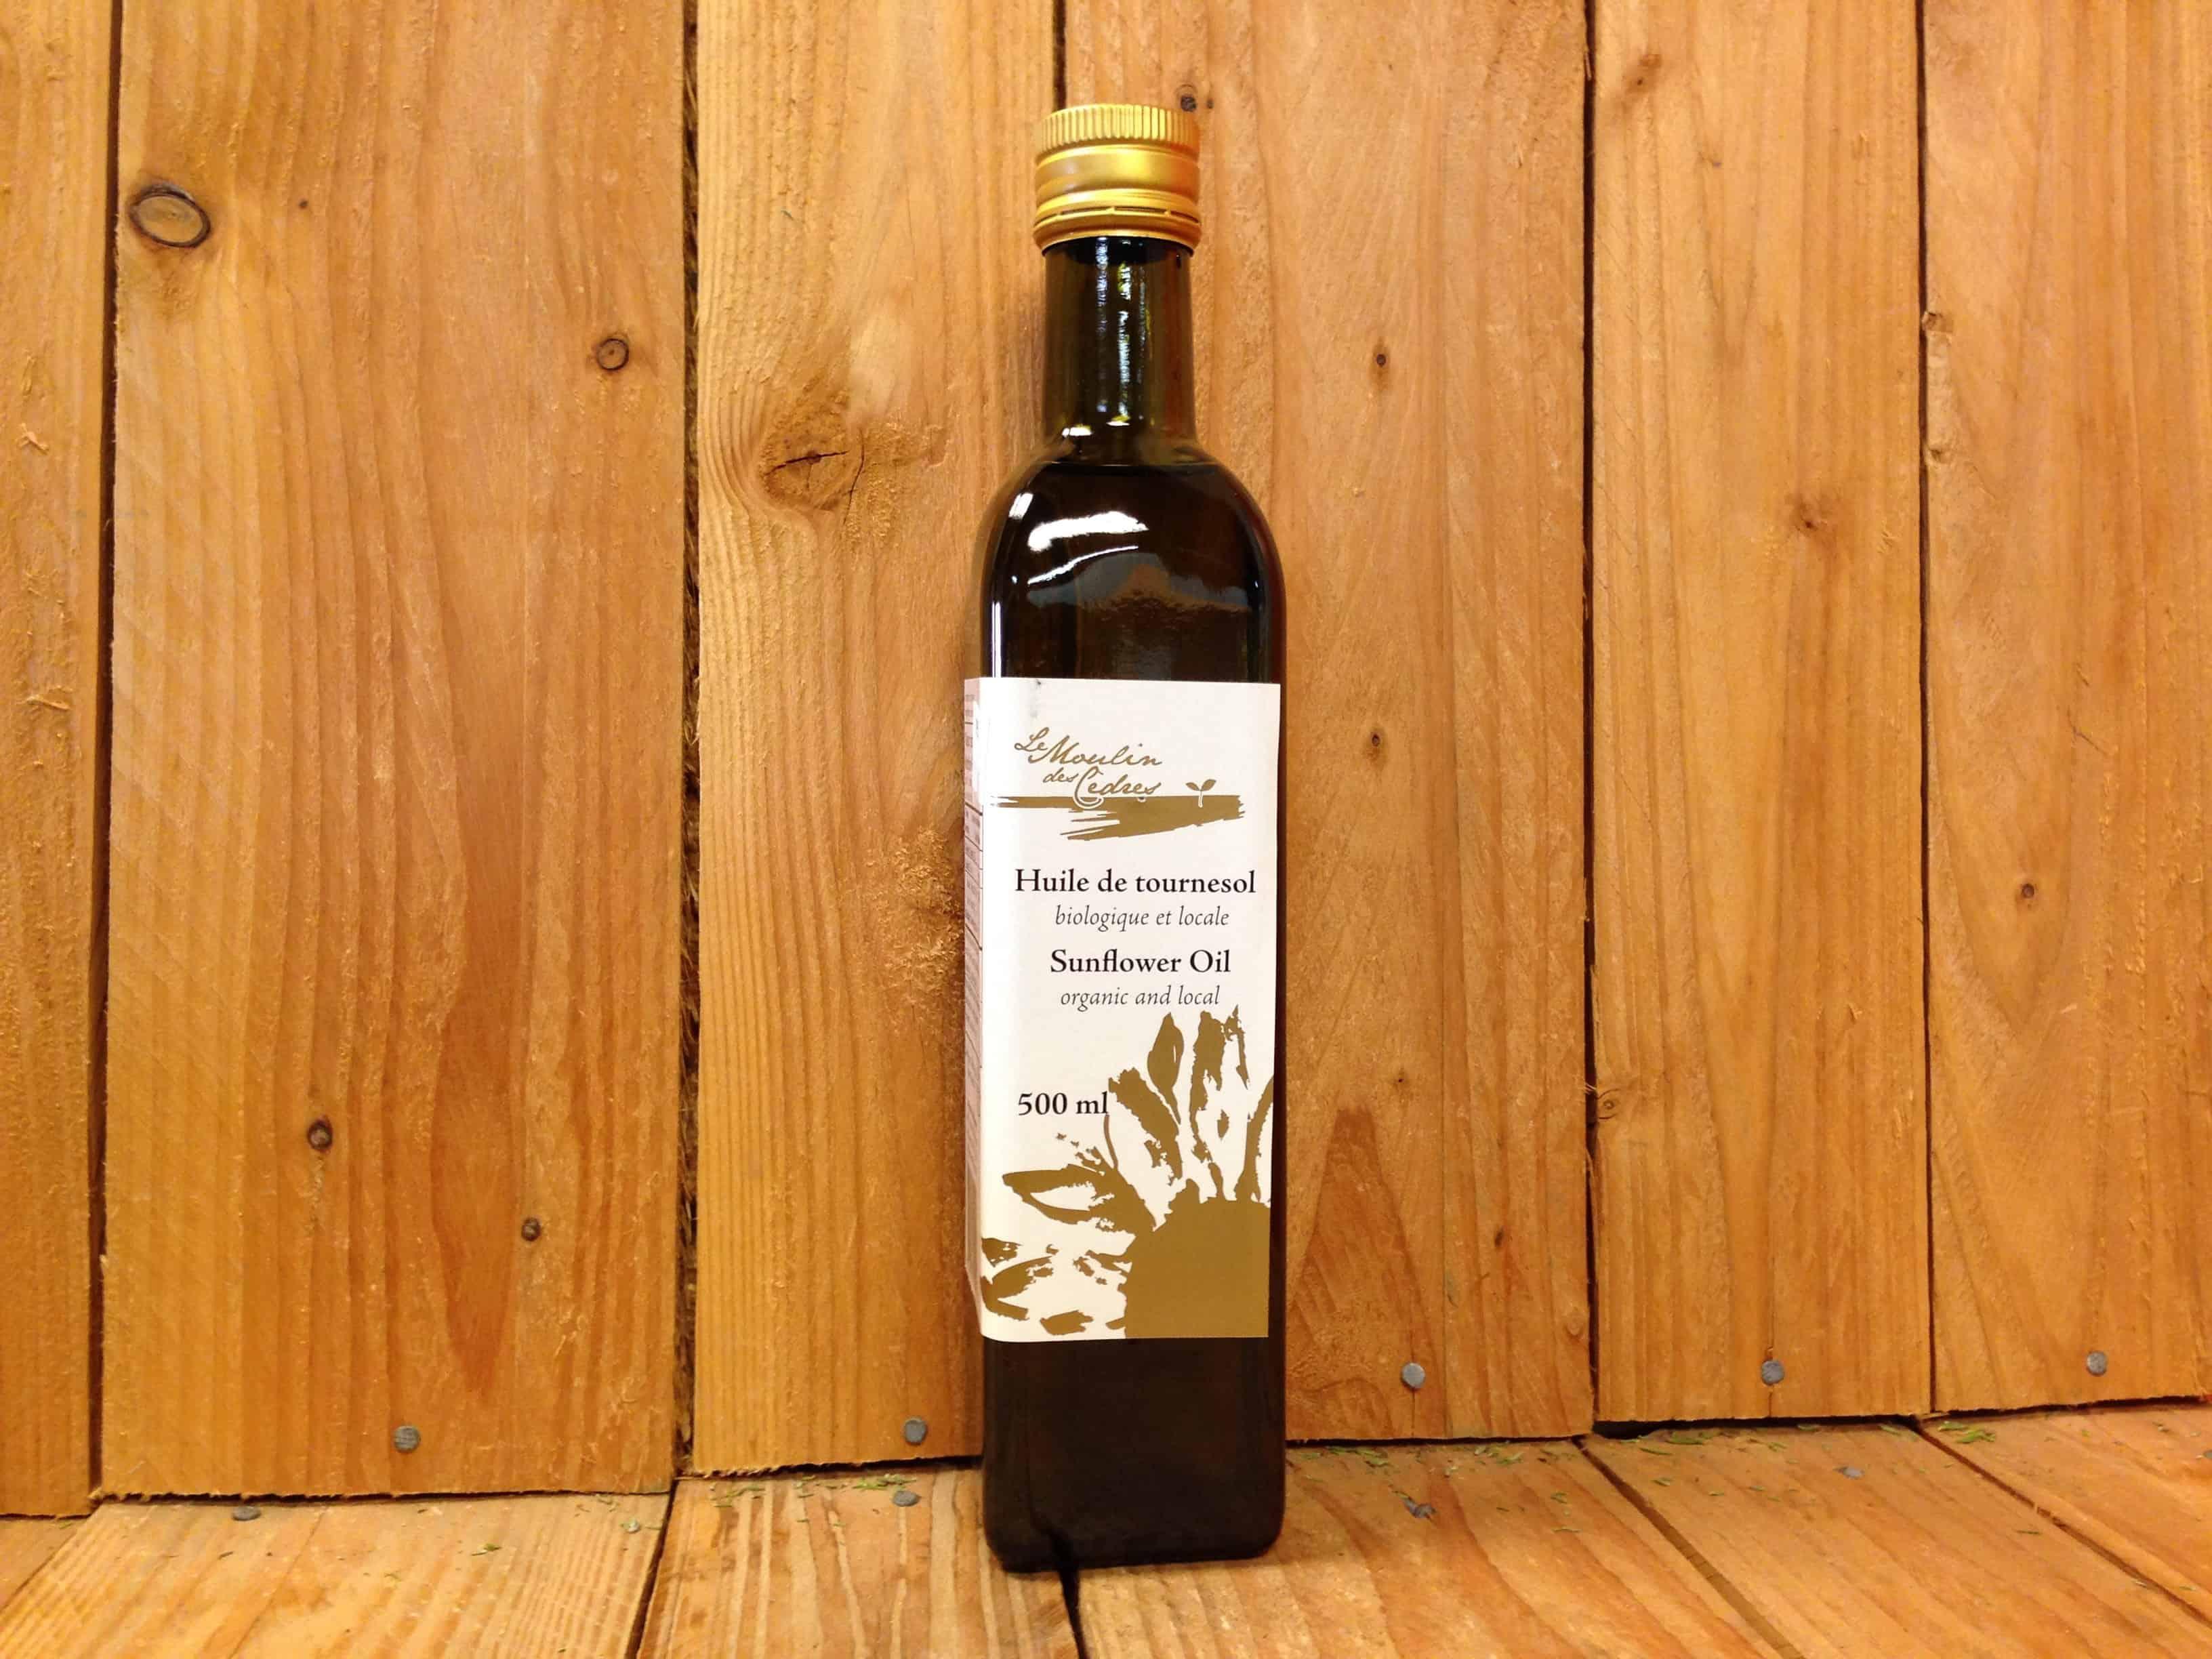 Les Moulins des Cedres – Sunflower Oil (500ml Bottle)